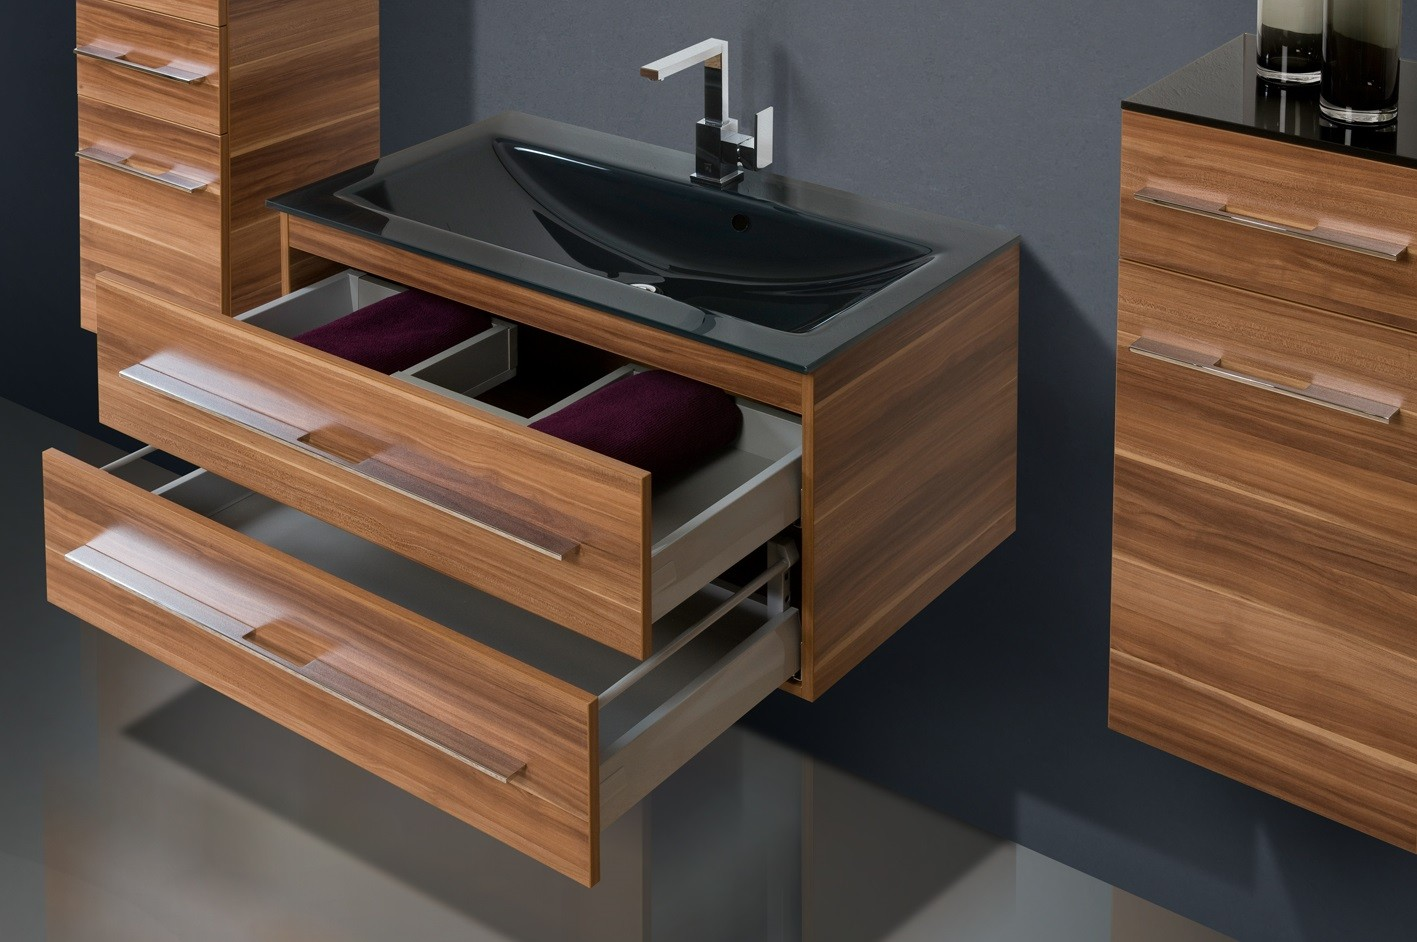 design badm bel set 90cm glaswaschtisch. Black Bedroom Furniture Sets. Home Design Ideas